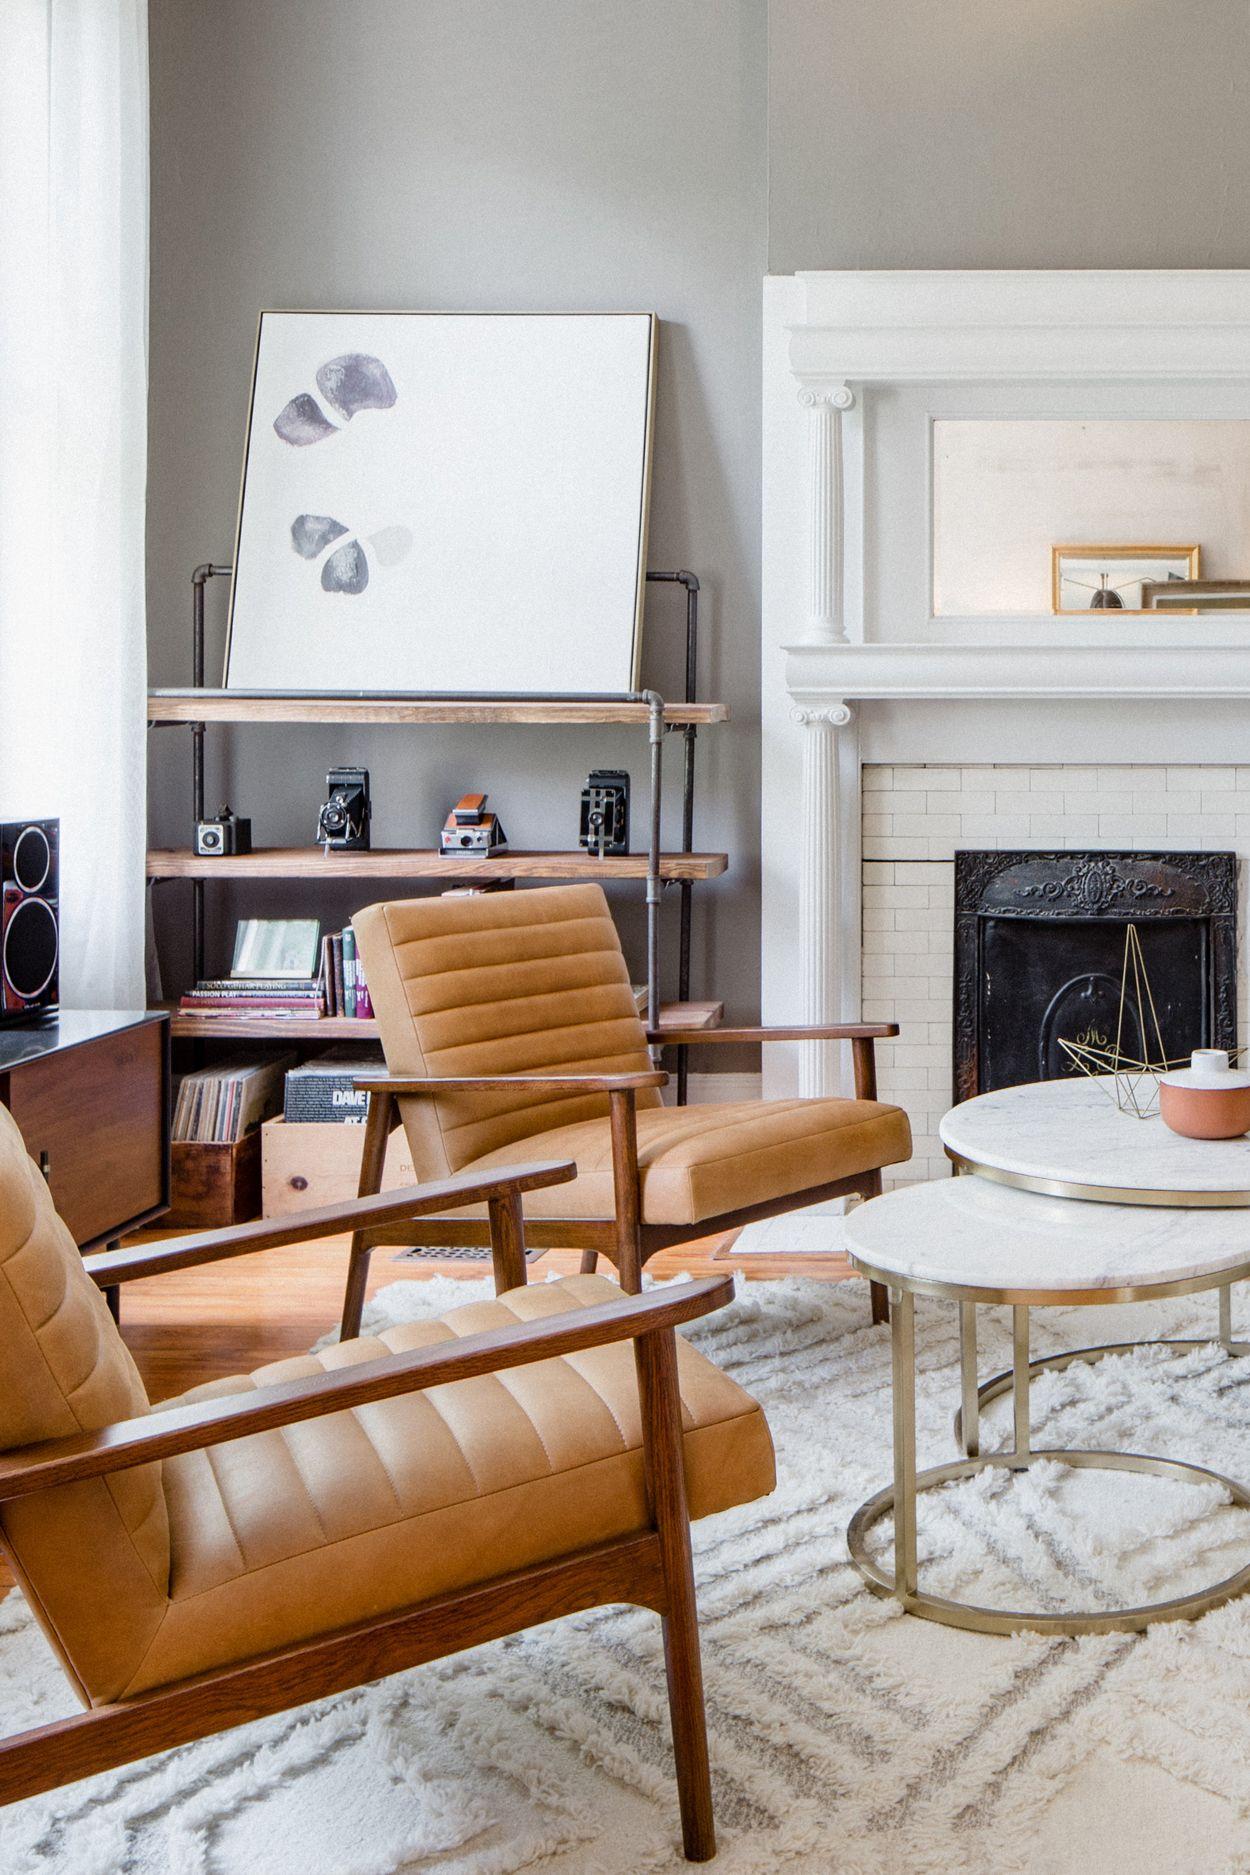 Thetis Charme Tan Chair Lounge Chairs Living Room Leather Chair Living Room Brown Leather Chair Living Room #tan #chairs #for #living #room